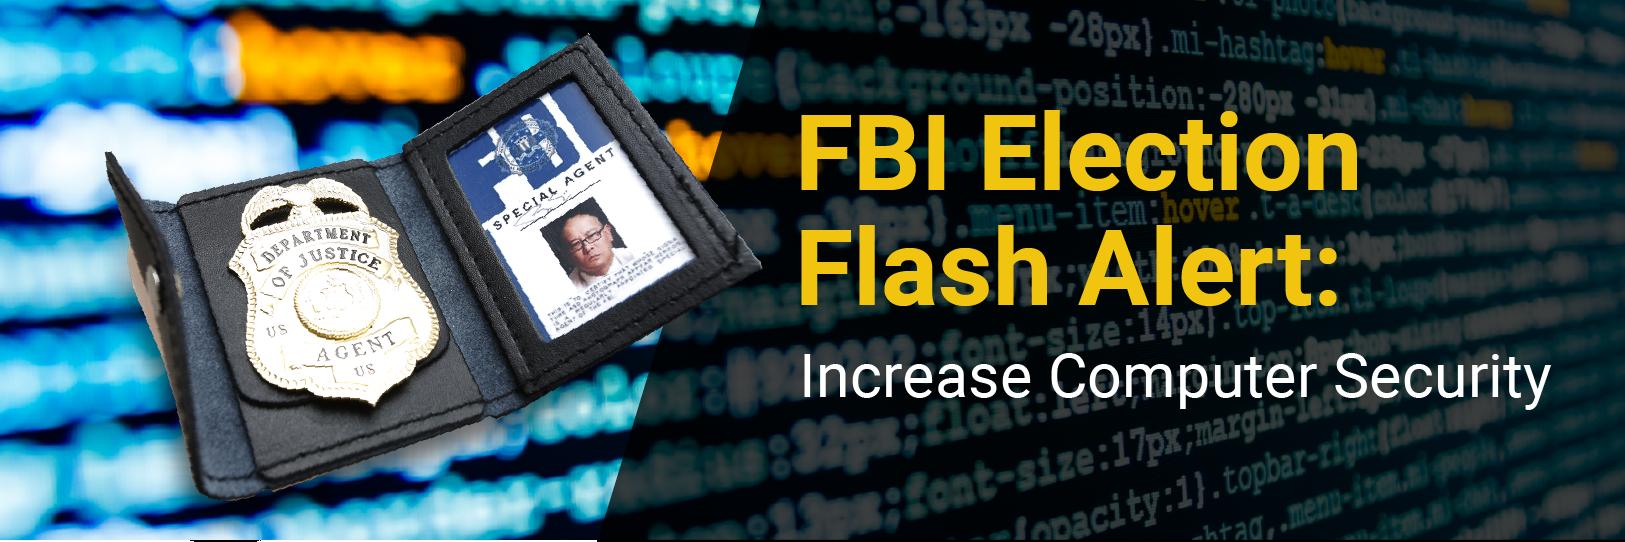 FBI Election Flash Alert: Increase Computer Security